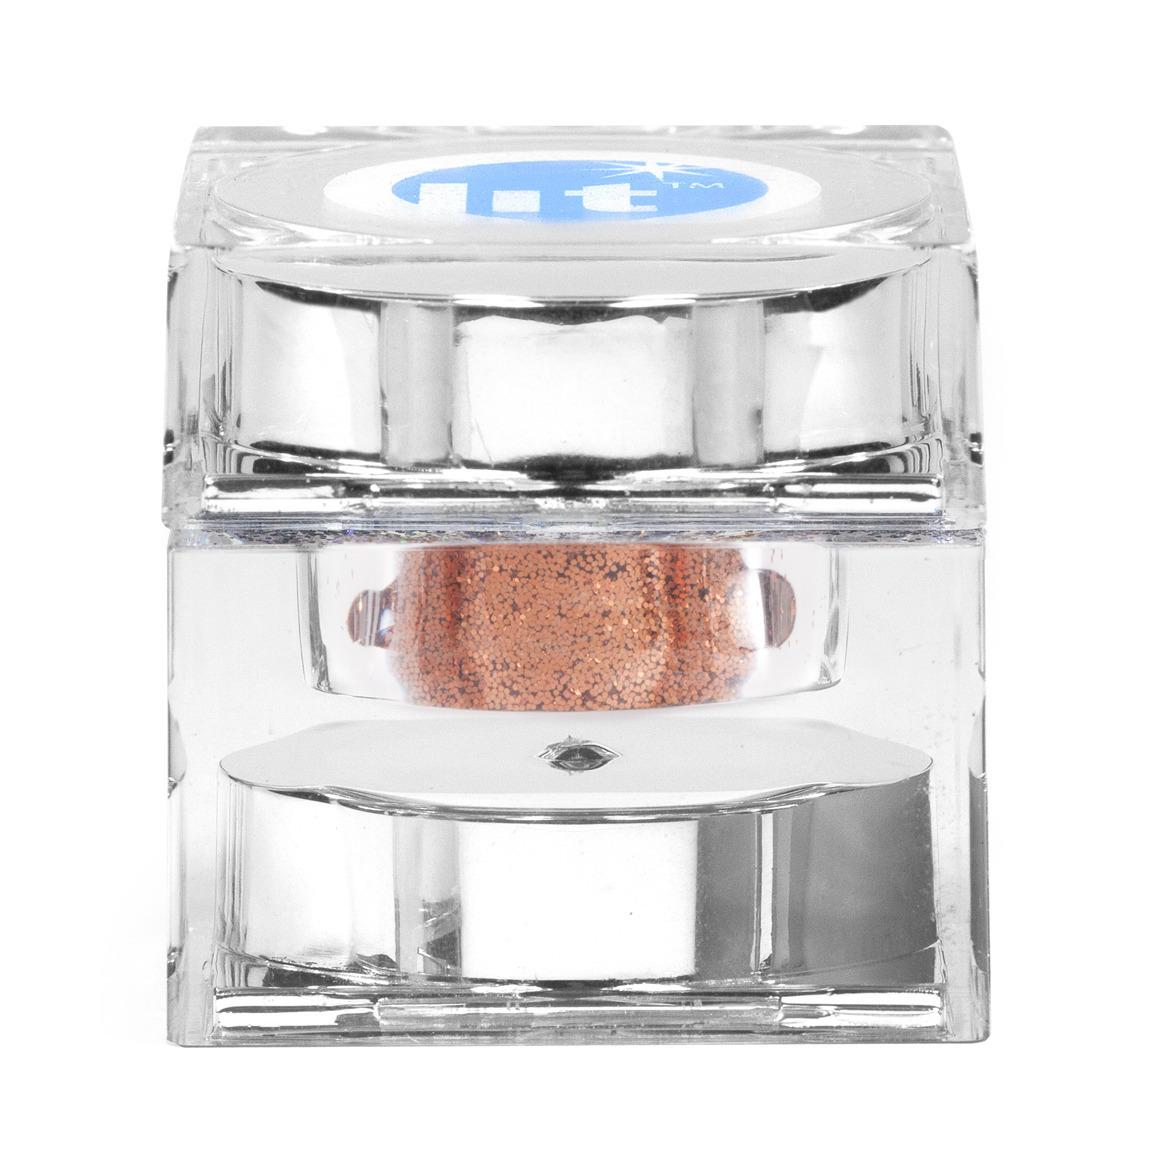 Lit Cosmetics Lit Glitter Hot Chocolate S3